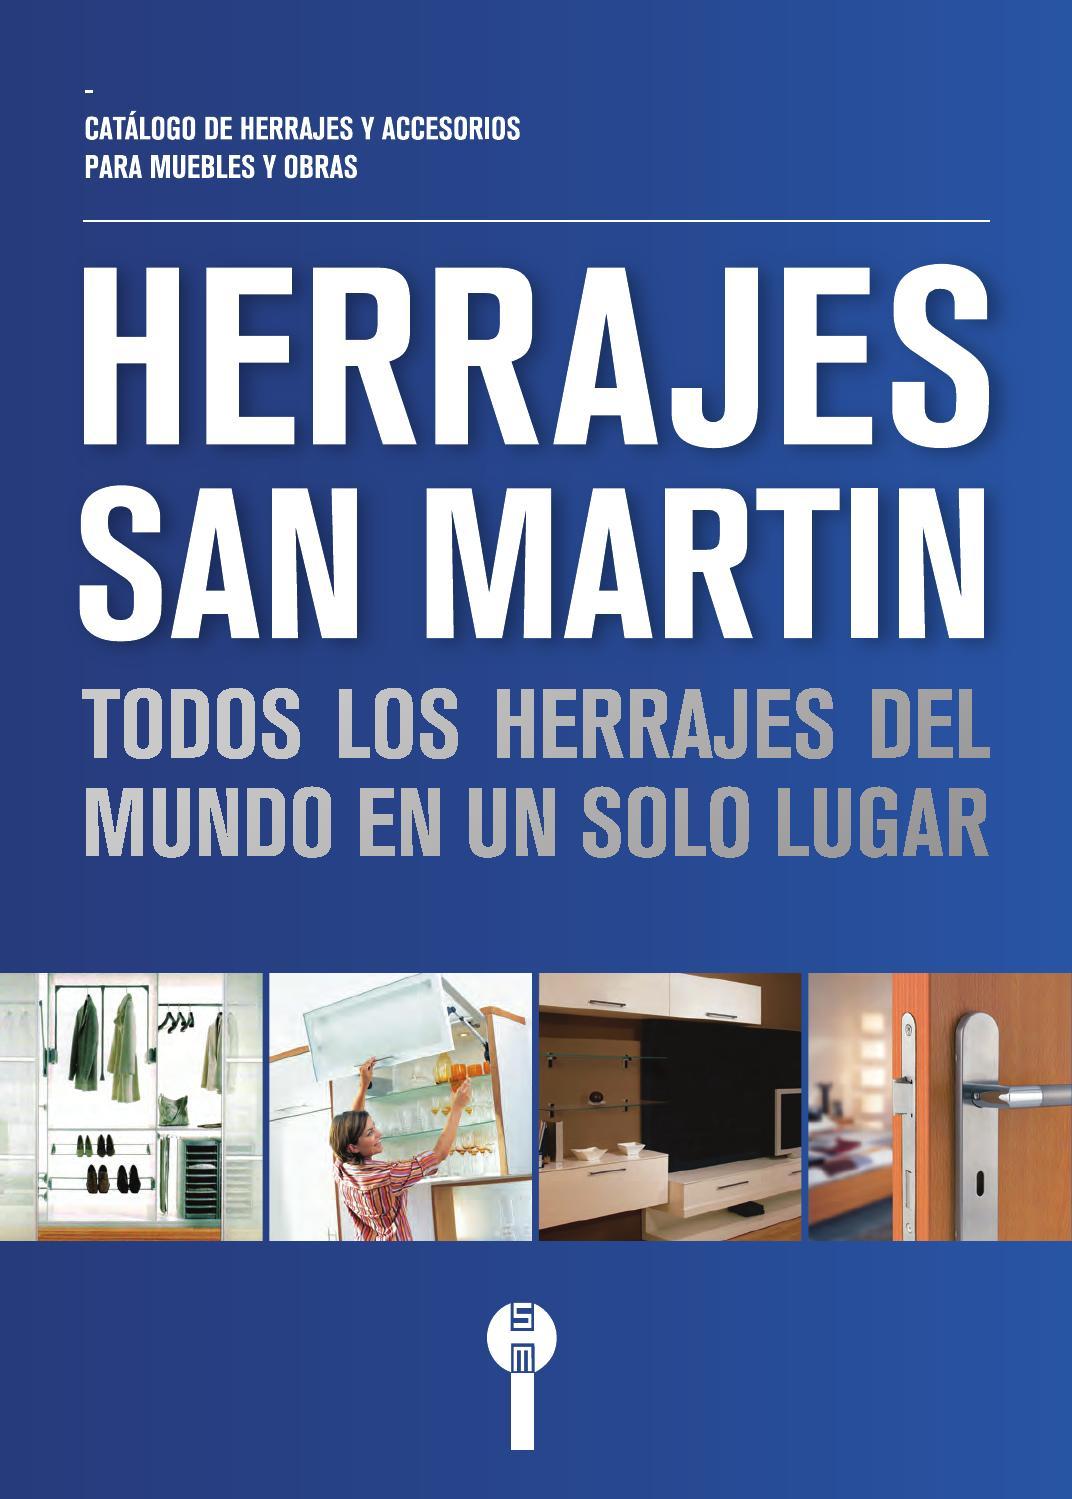 Cat logo de herrajes san mart n 2015 by herrajes san mart n issuu - Muebles martin catalogo ...